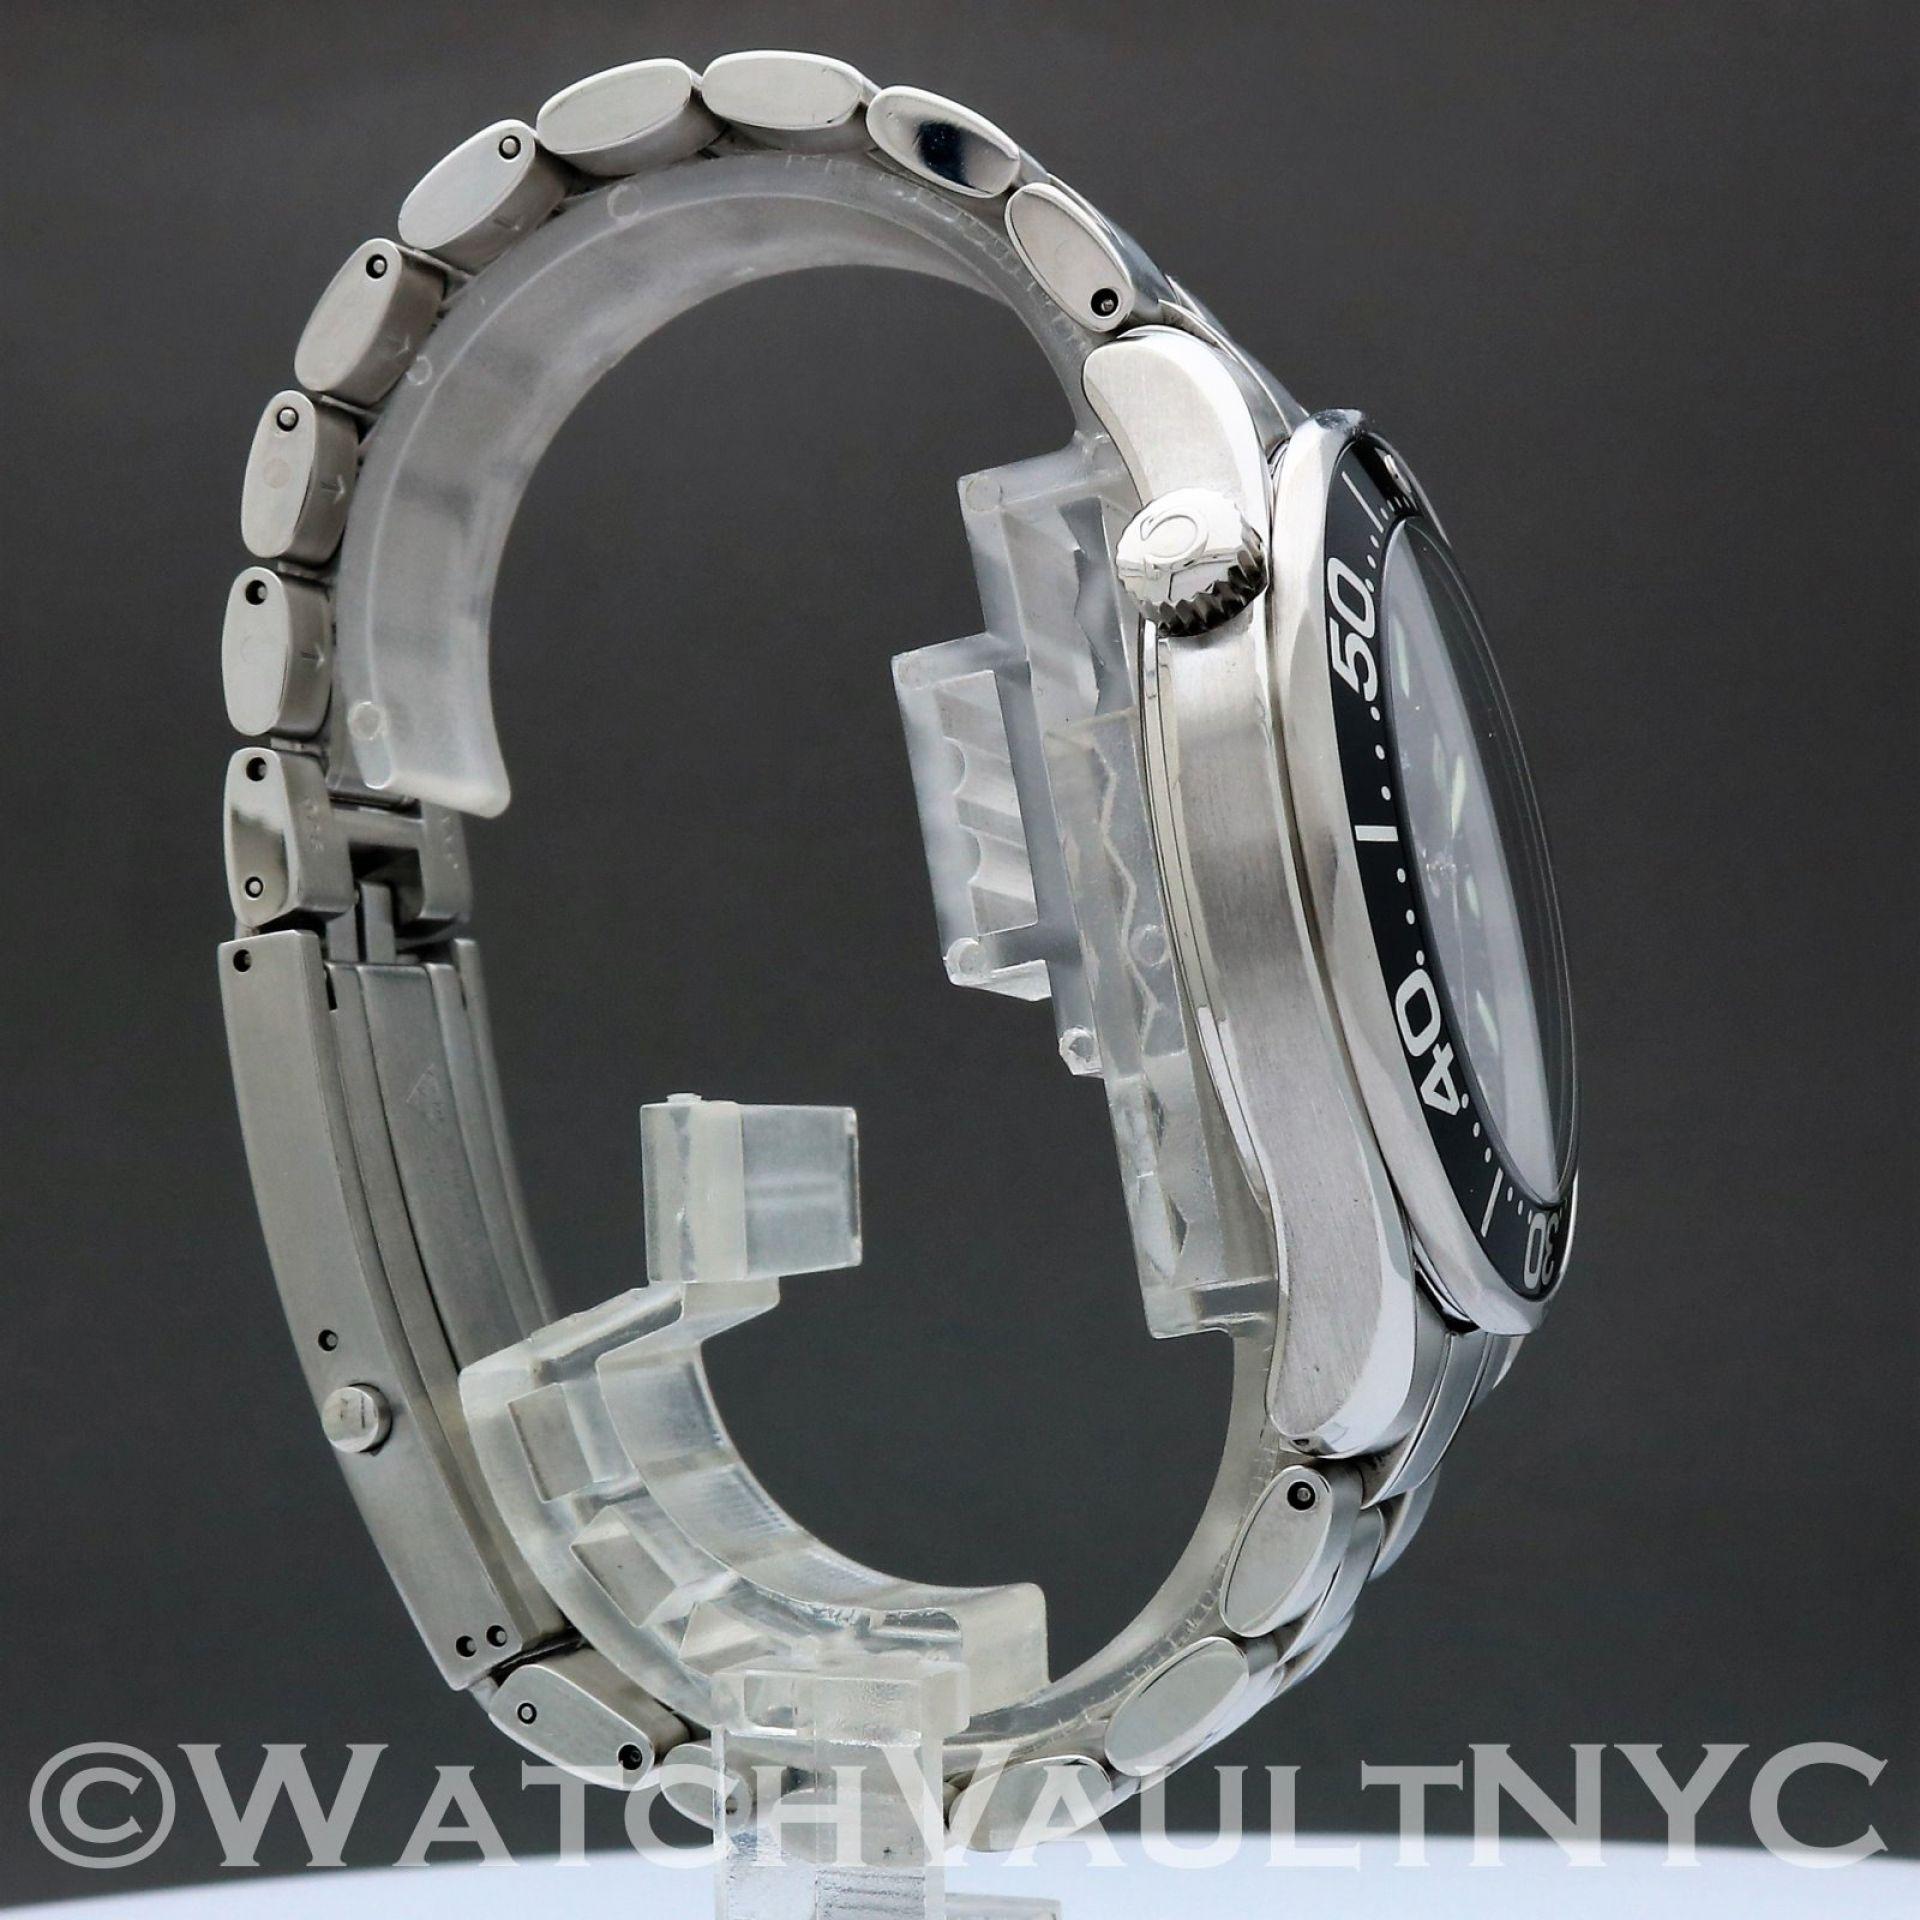 Omega Seamaster Professional 300M 2264.50 Sword Hands 41mm Quartz RK204